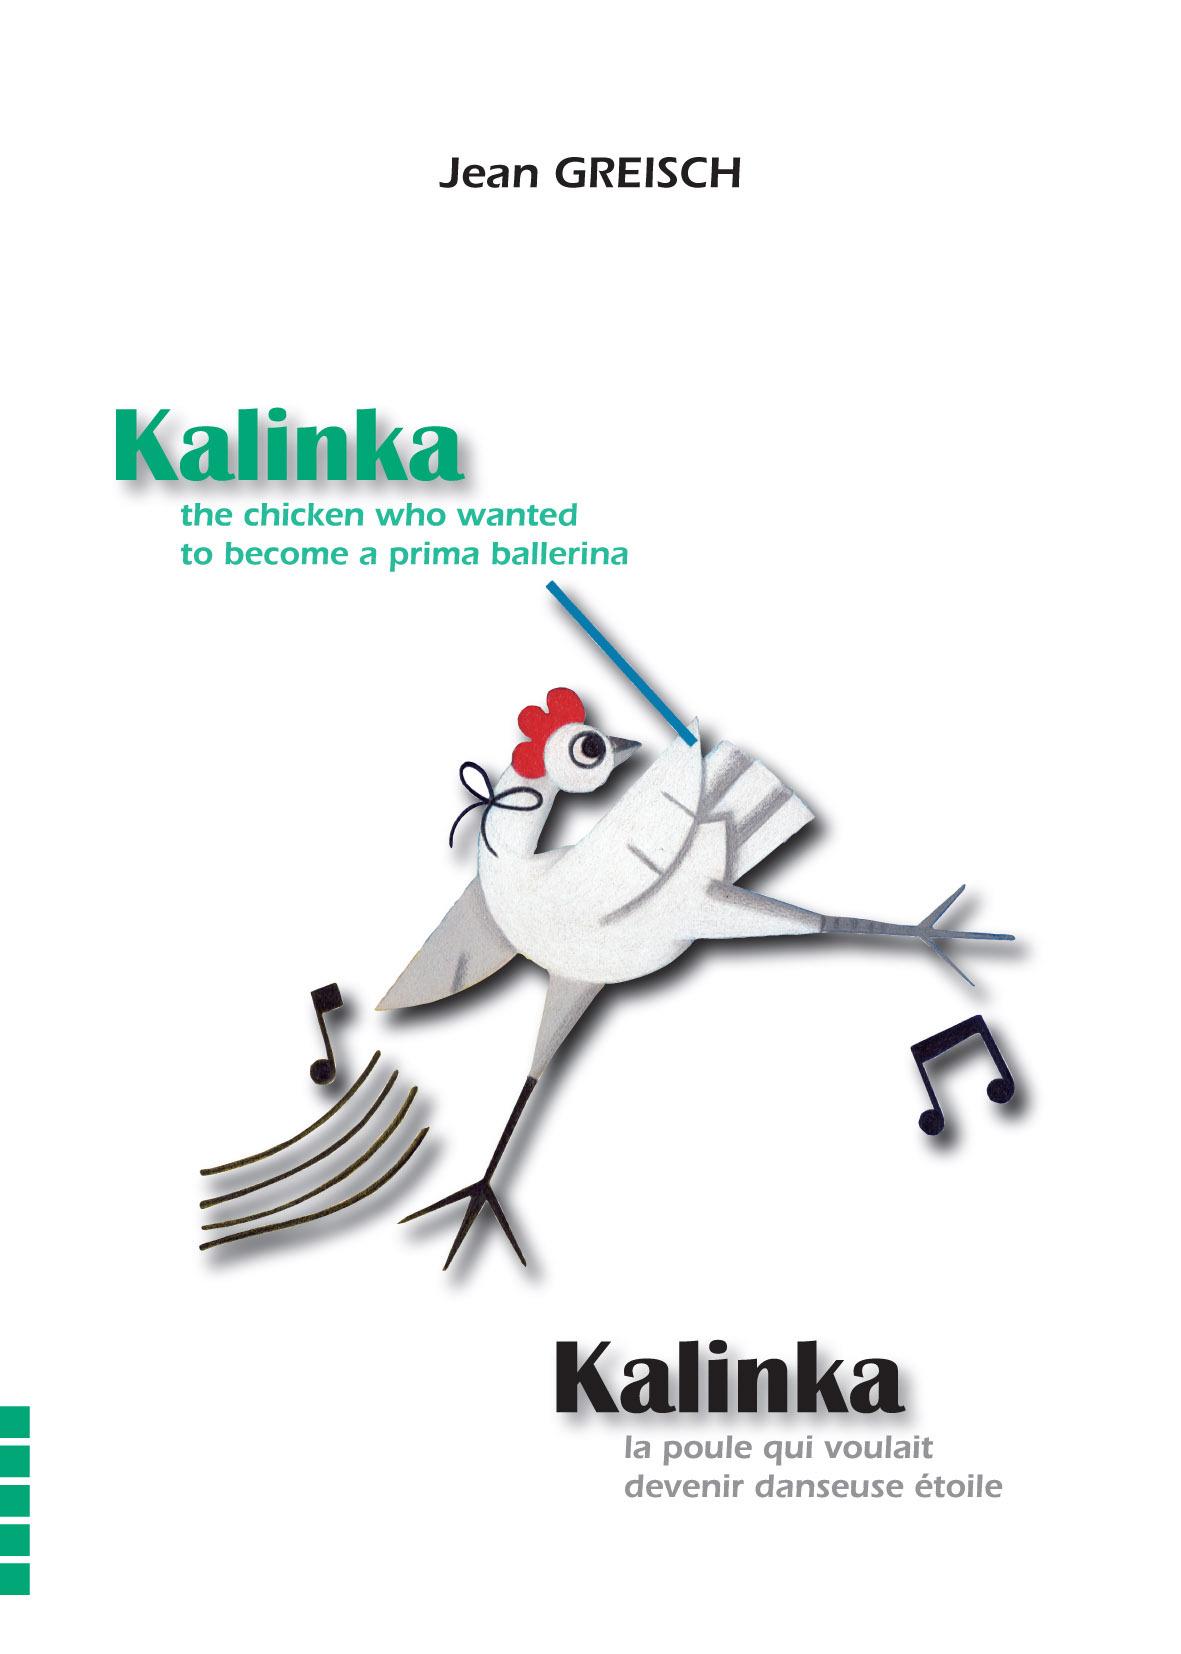 KALINKA, LA POULE QUI VOULAIT DEVENIR DANSEUSE-ETOILE / KALINKA, THE CHICKEN WHO WANTED TO BECOME A